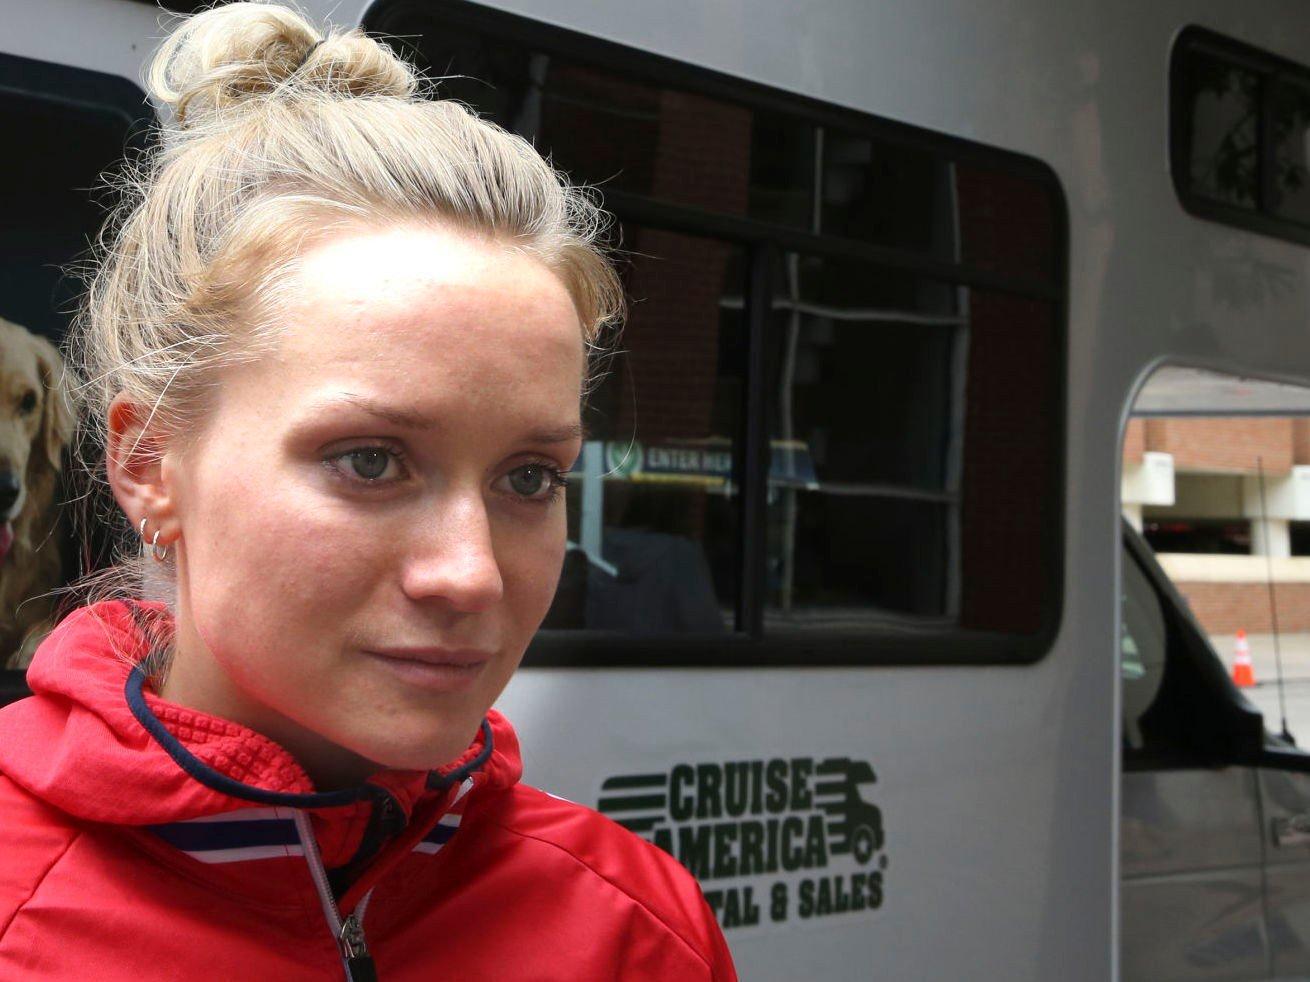 STOR NEDTUR: En skuffet Miriam Bjørnsrud måtte bryte sykkel-VM med sykdom. Foto: Terje Pedersen / NTB scanpix